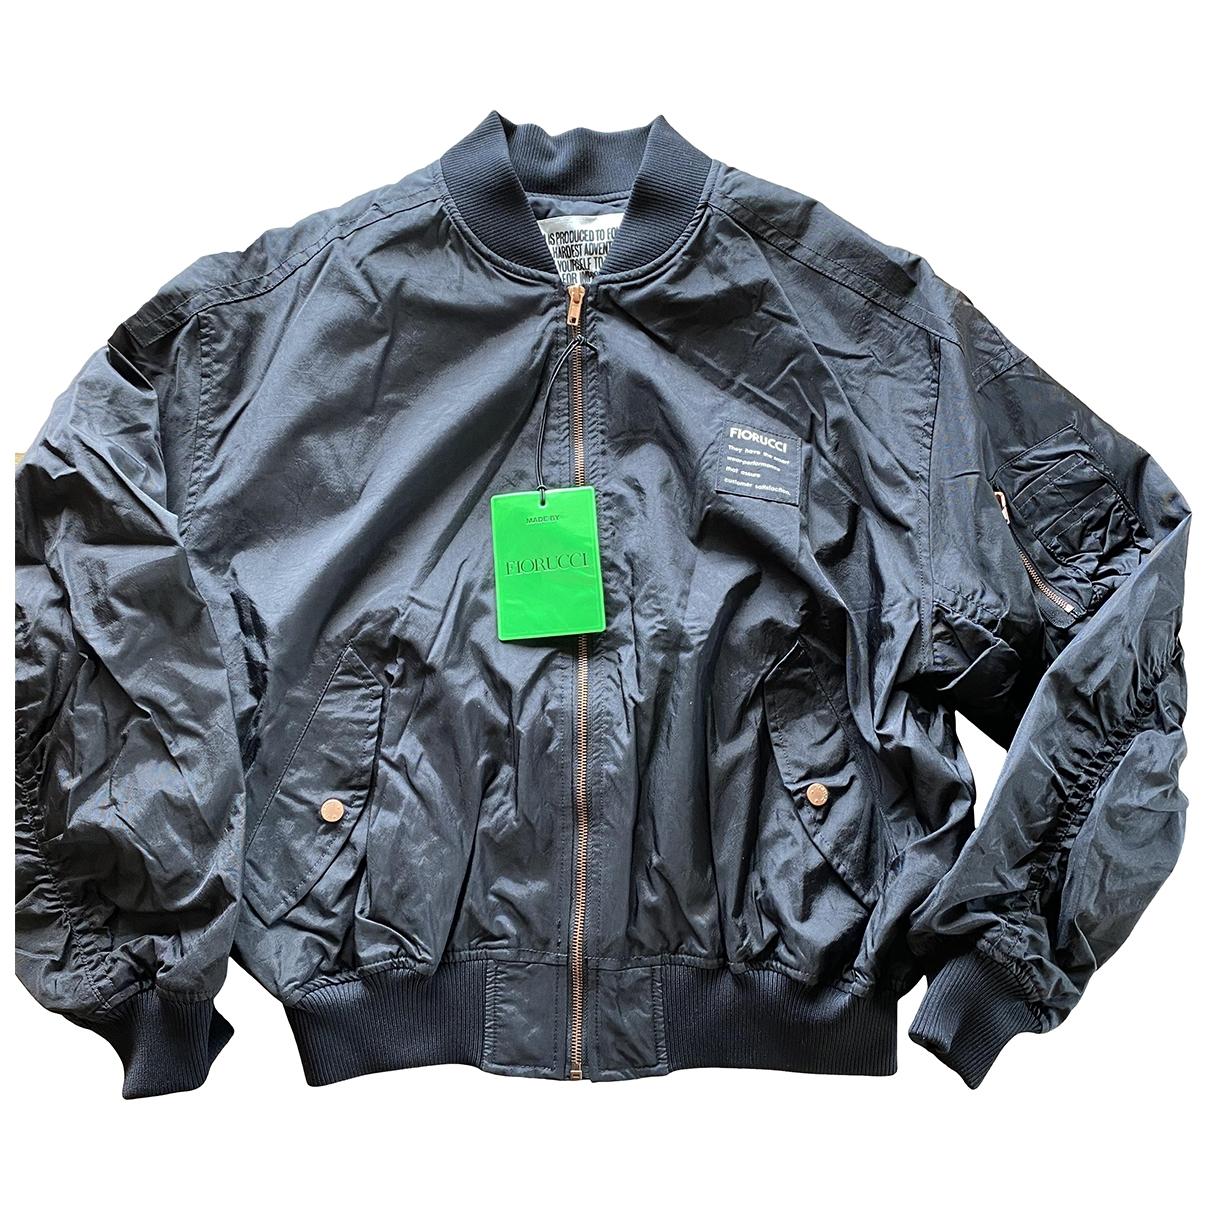 Fiorucci \N Black jacket for Women M International